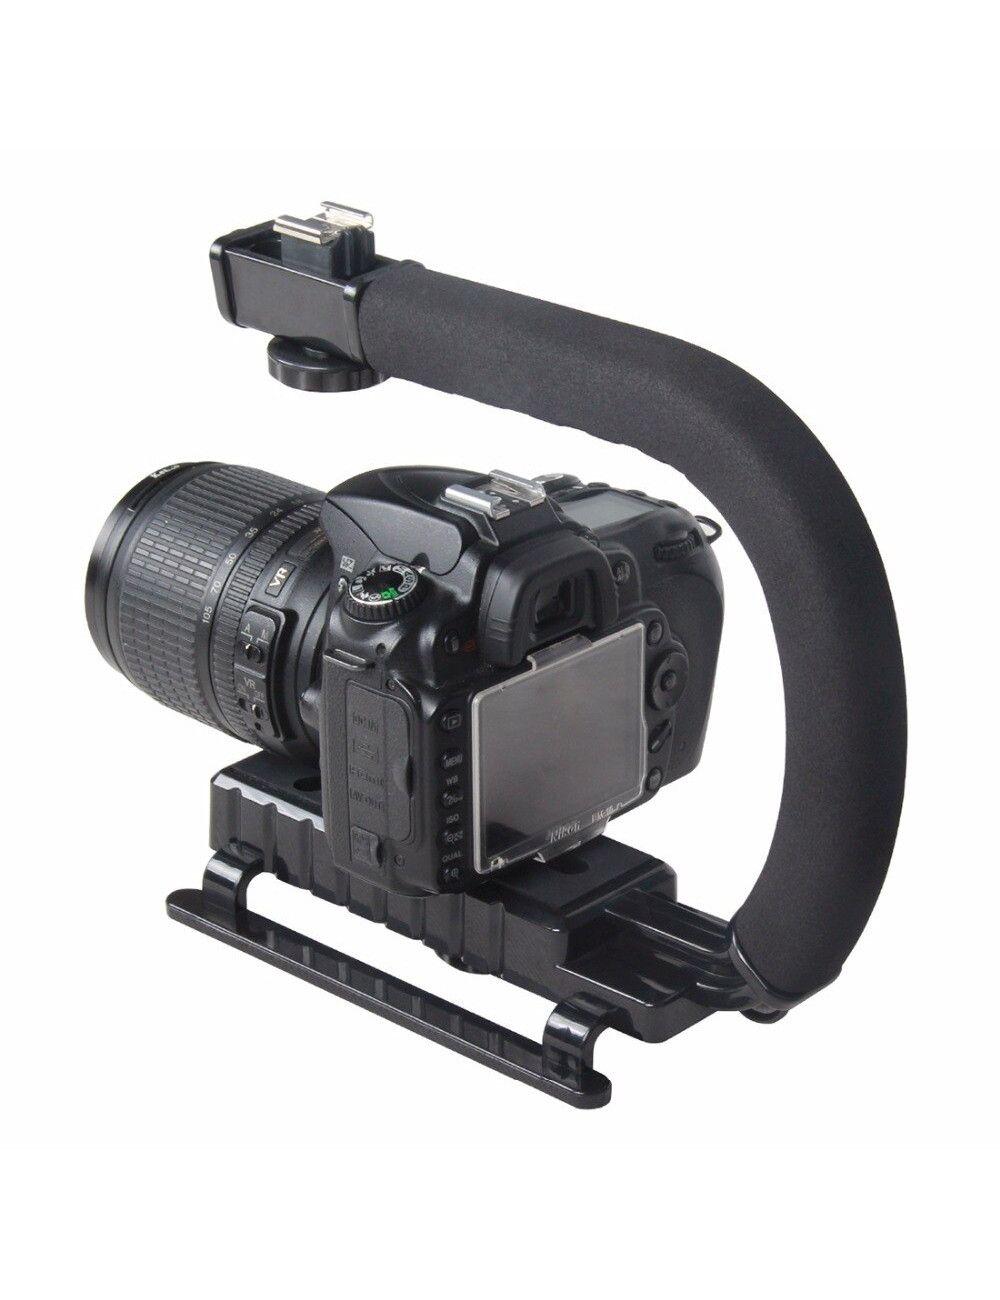 Profoto A1x AirTTL-N Flash Profesional para Cámaras Nikon - Nueva version!